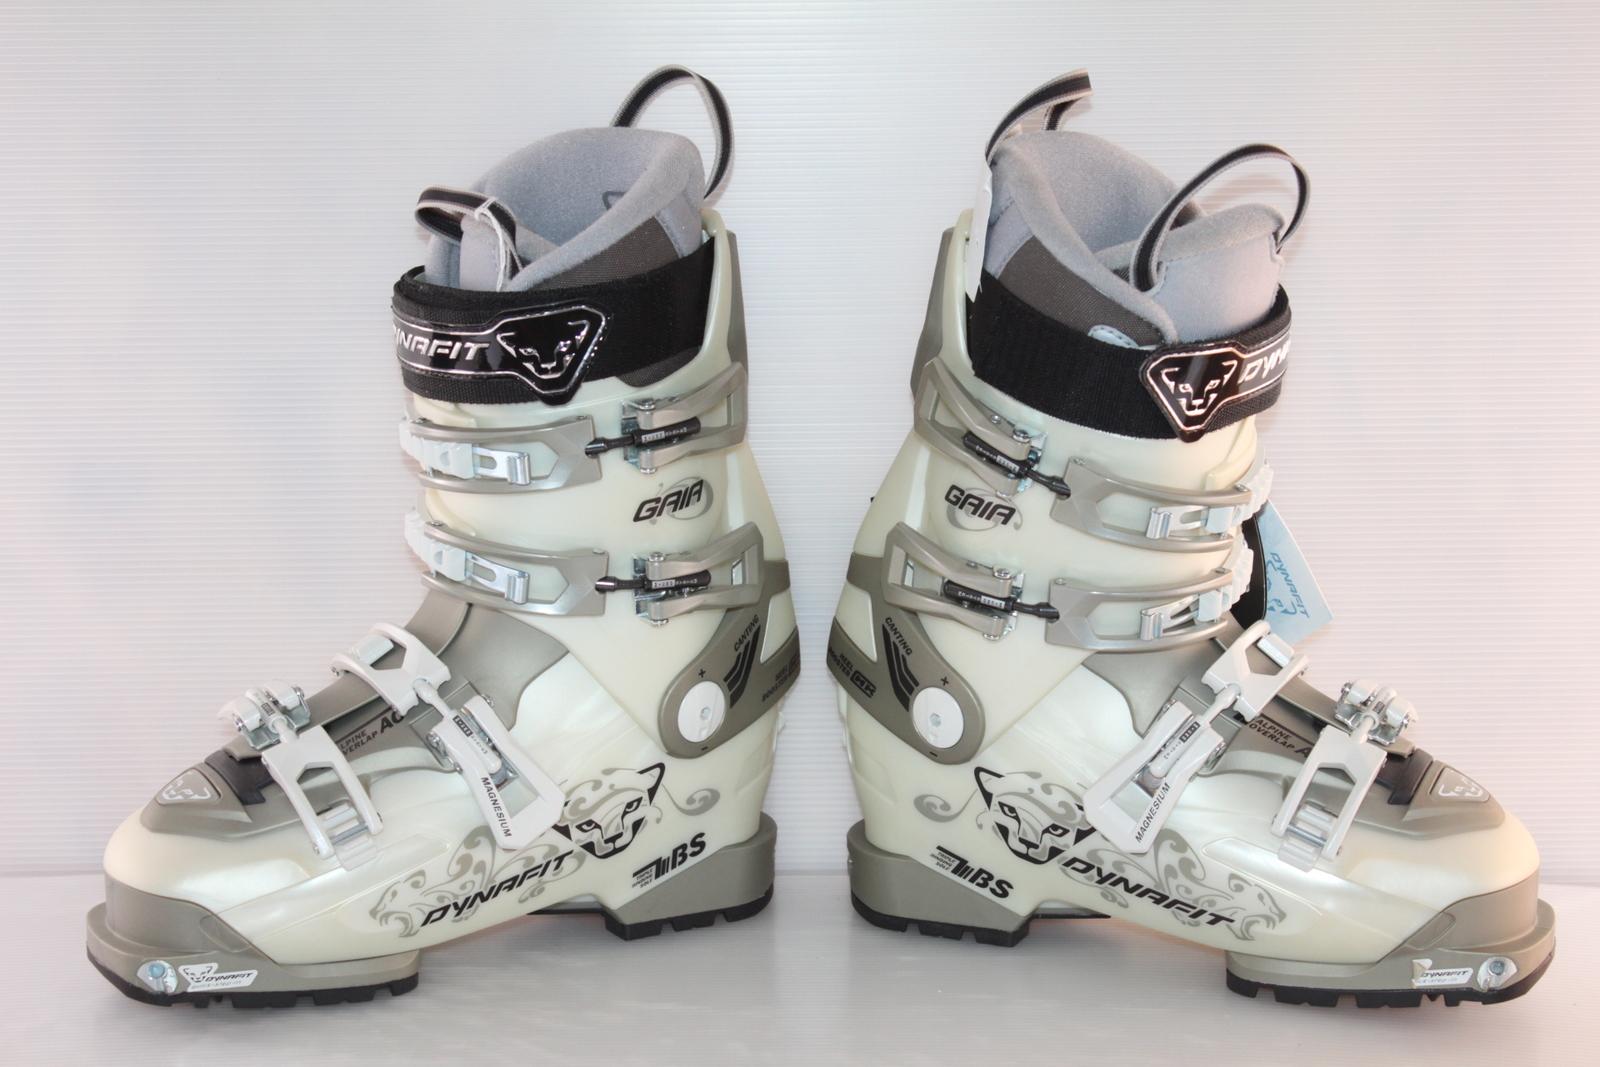 Dámské skialpové boty Dynafit Gaia FX - skialp vel. EU38